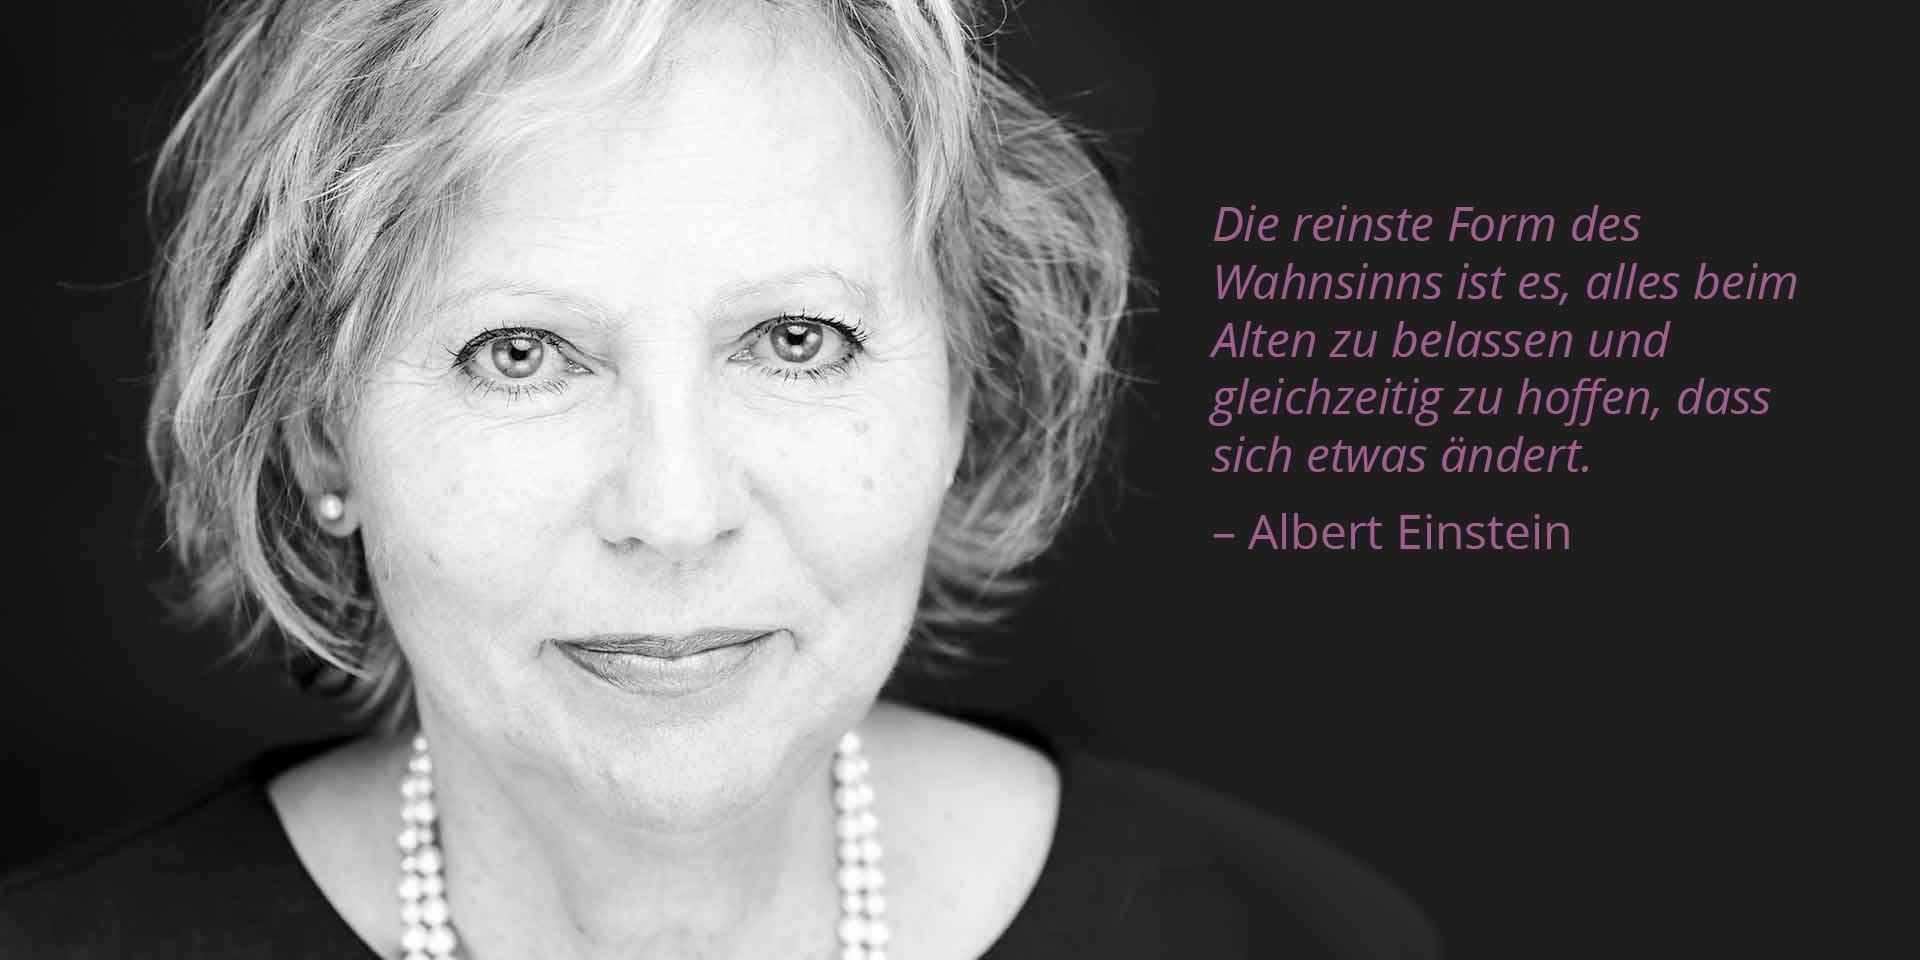 Life Coach Eveline Weber